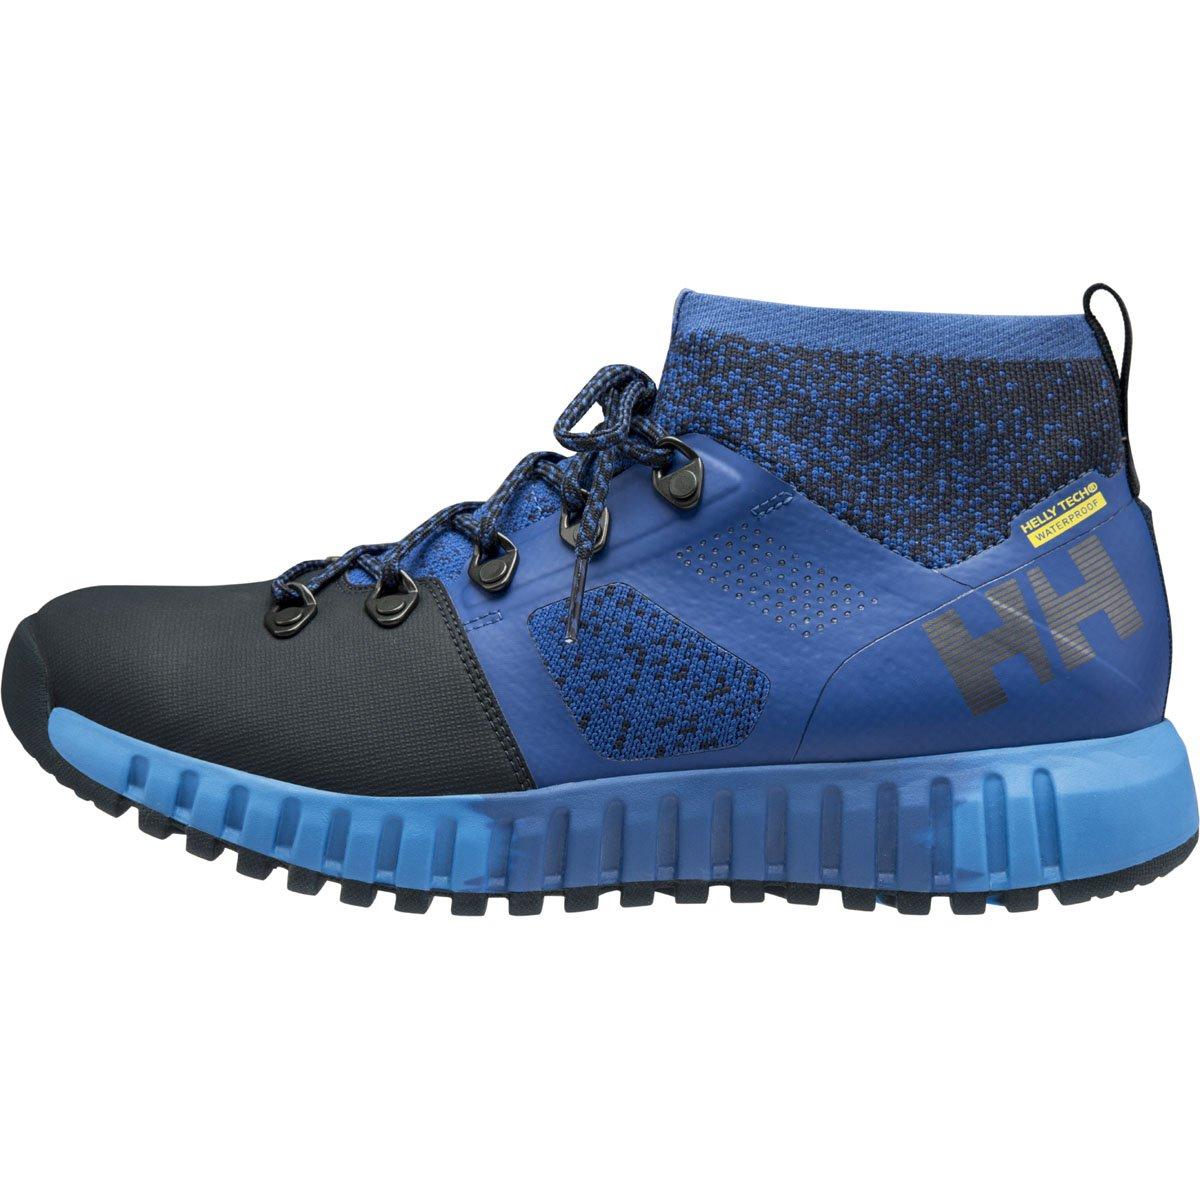 2018 Men's Vanir Canter High Top Hiking Shoe - 11406_482